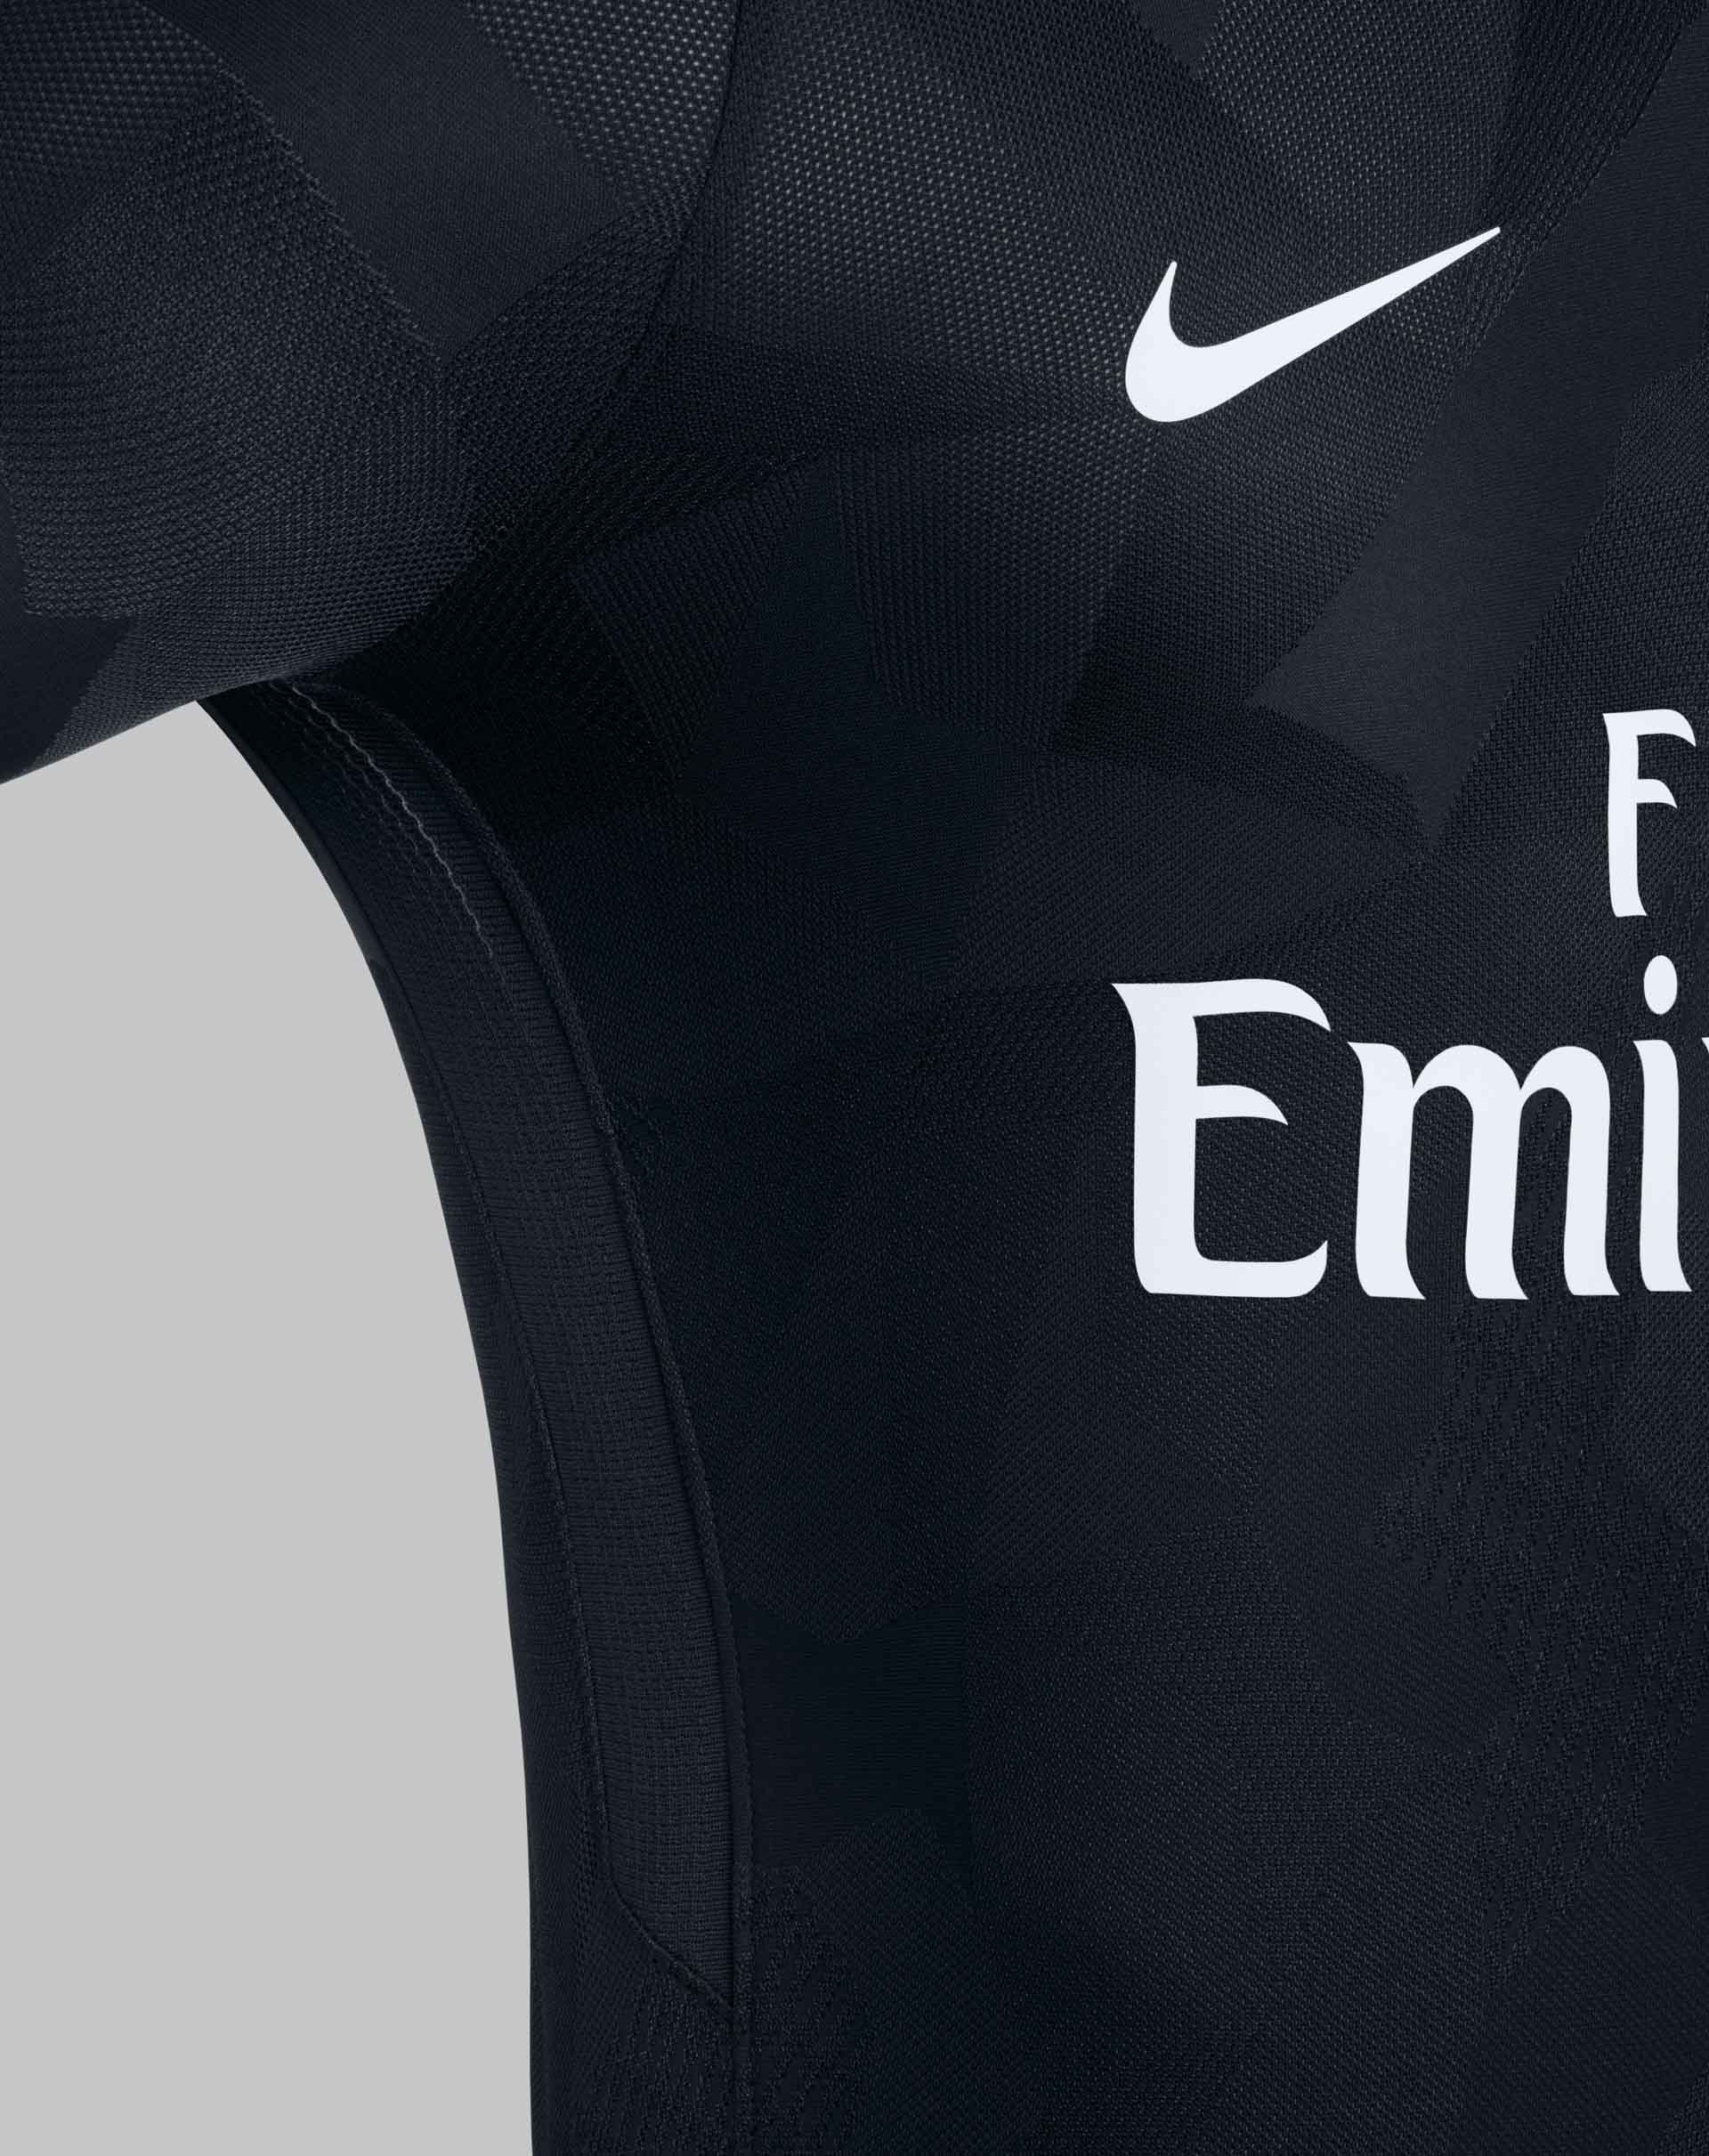 huge selection of 01d4b 07954 Neymar Reveals PSG 17/18 Nike Third Kit - SoccerBible